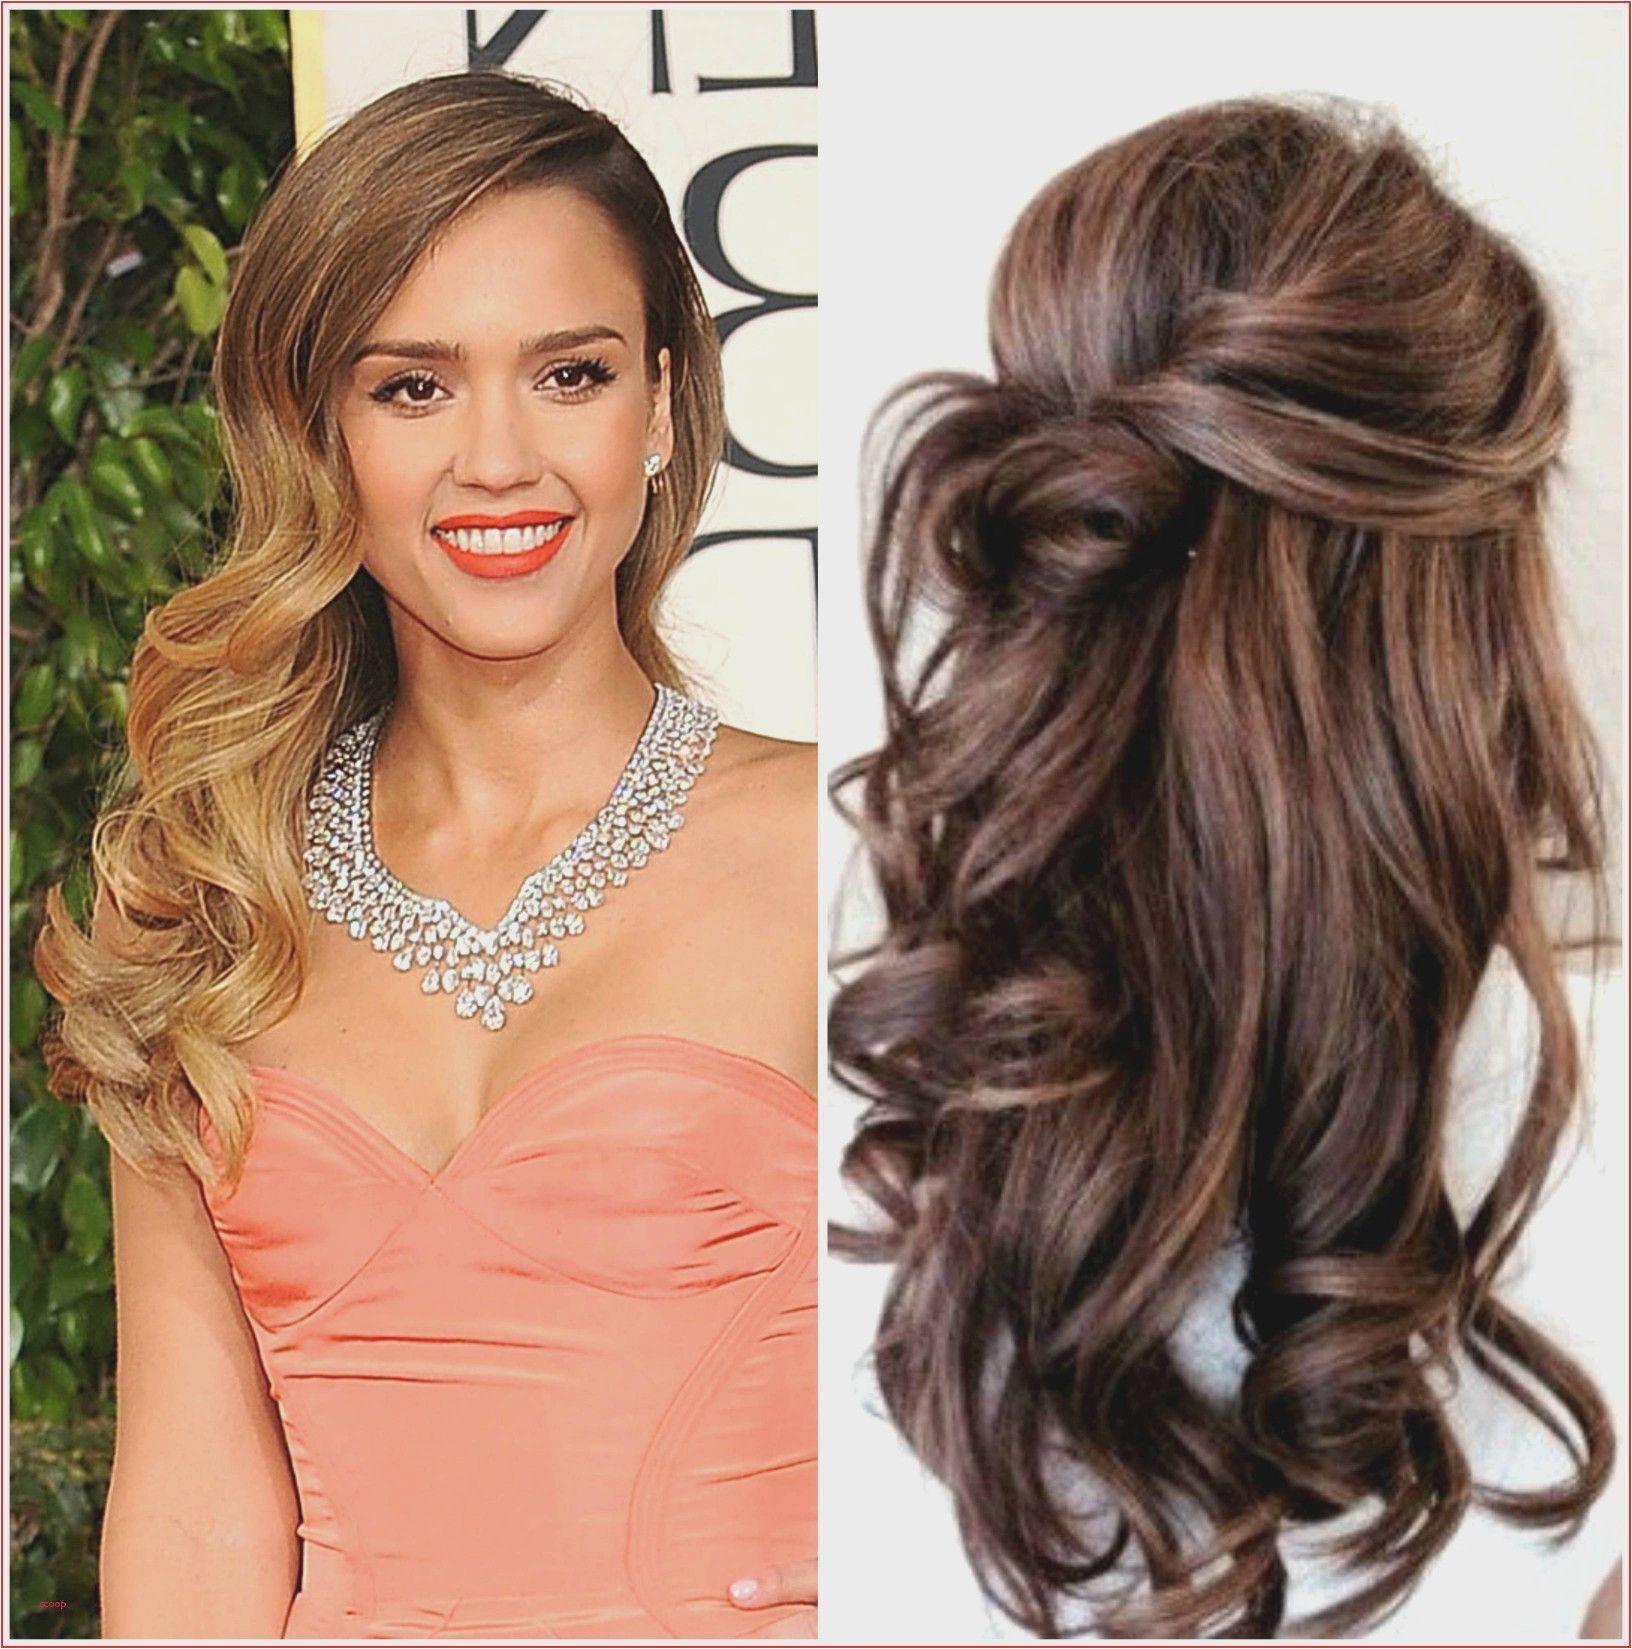 Hairstyles for Teen Girls Best Medium Hairstyles for Teens Hairstyle for Medium Hair 0d Journal